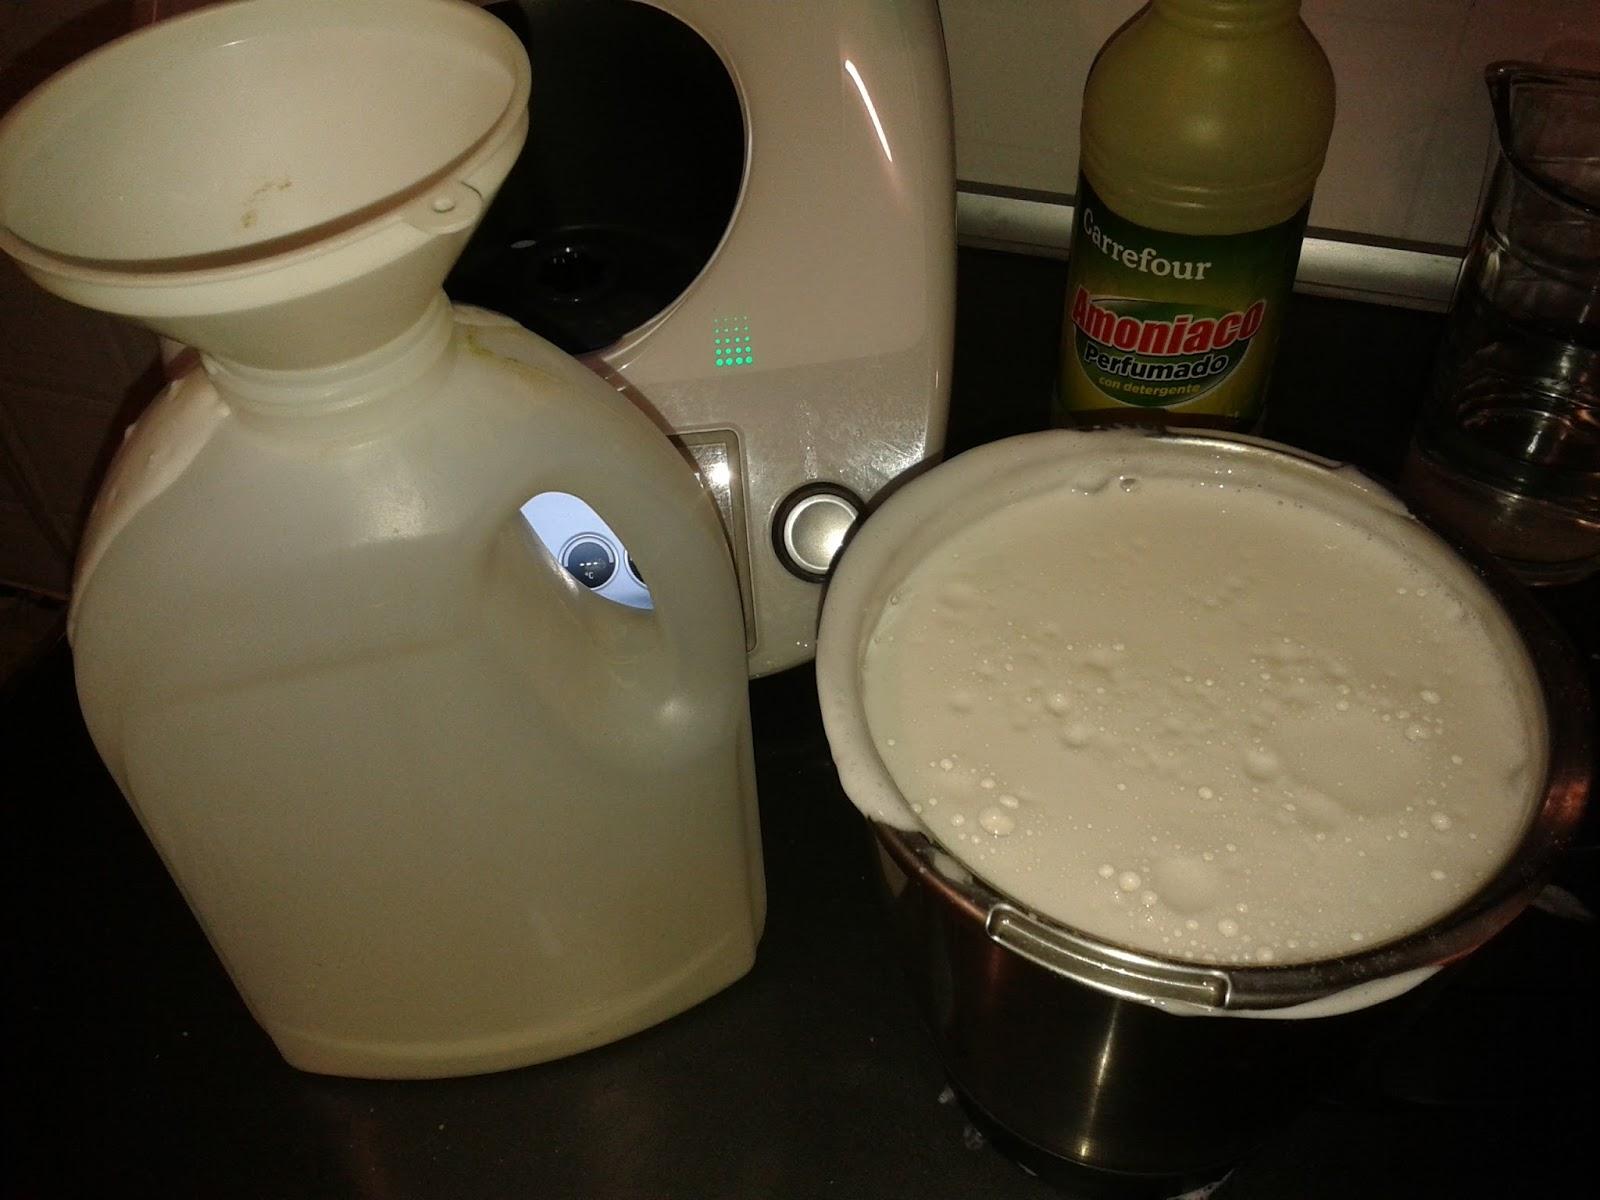 Catcakecook jab n para lavadora ecol gico - Jabon natural para lavadora ...